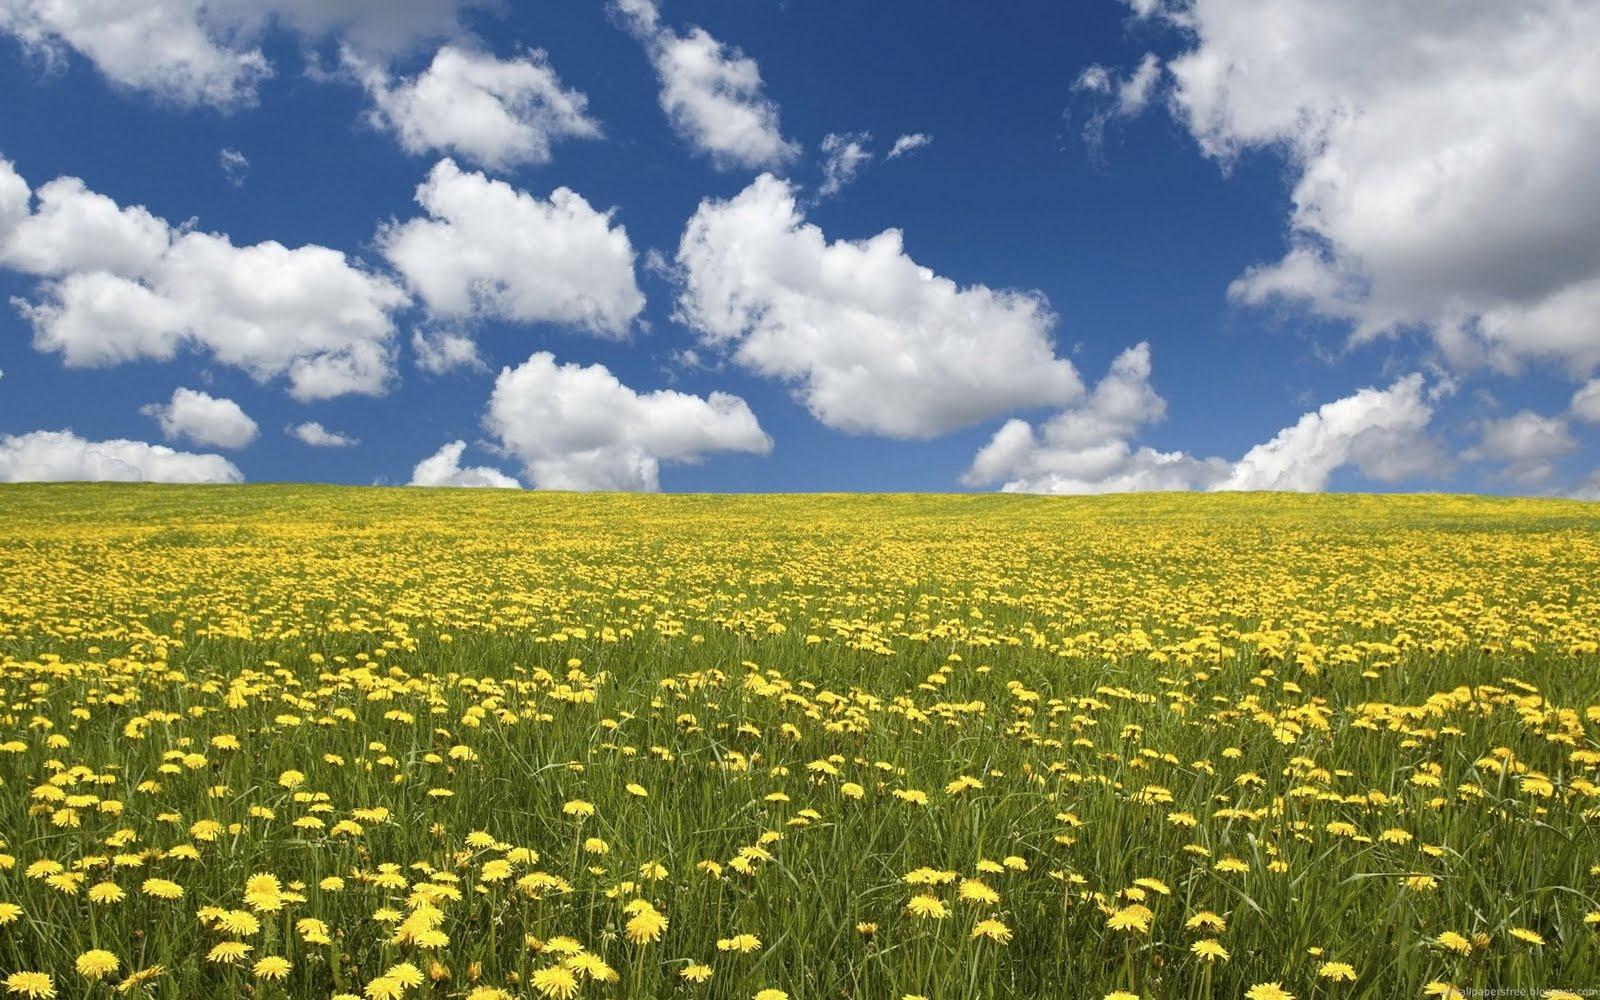 http://4.bp.blogspot.com/-CKffDxpn4D8/TXu8x4Db3lI/AAAAAAAAS9g/9s2wWhIVnxw/s1600/Field-of-Flowers-Nature-Wallpaper.jpg